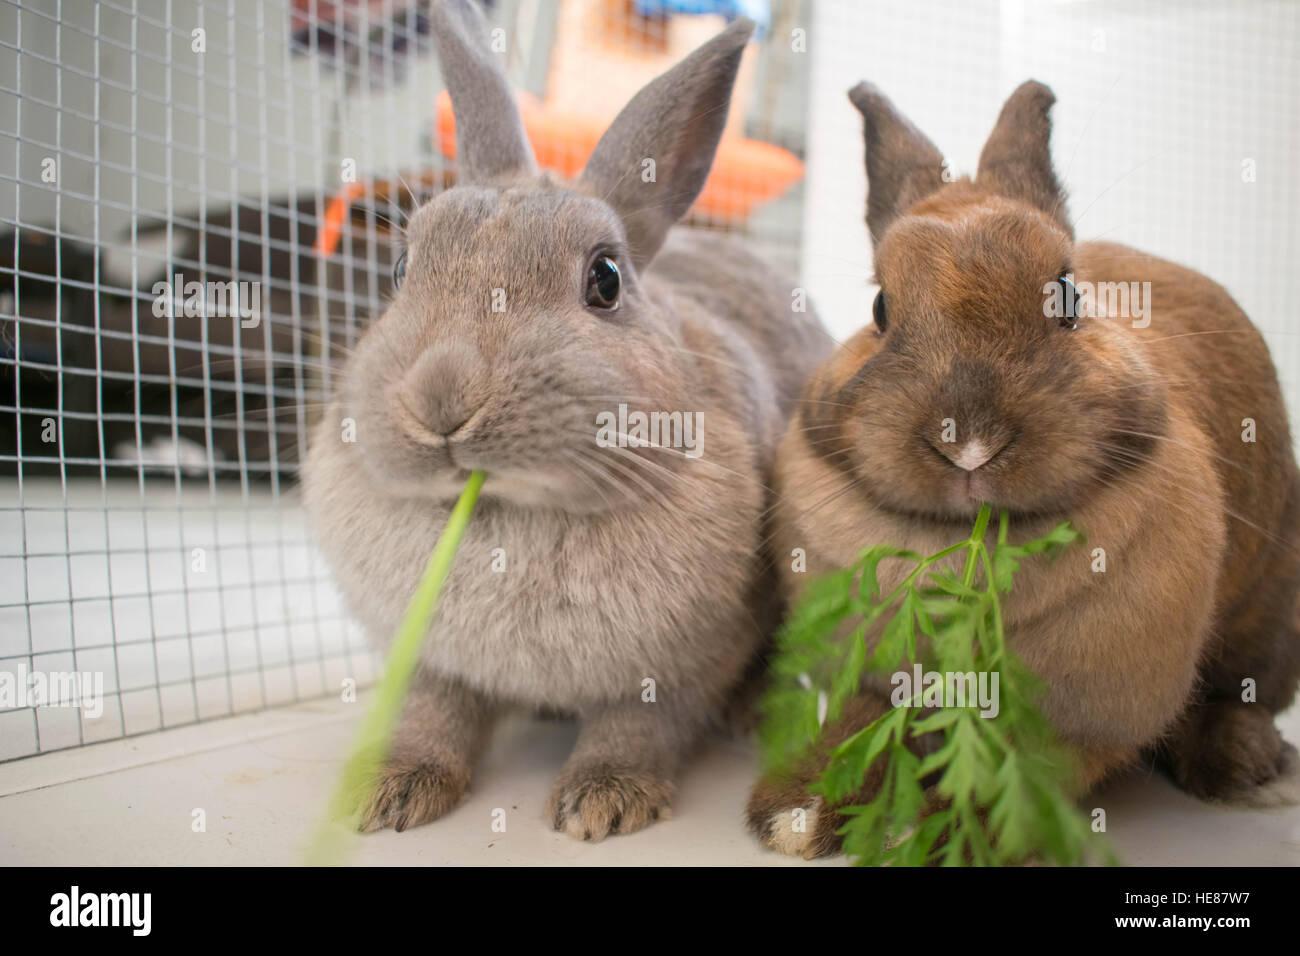 close up rabbits nose stockfotos close up rabbits nose bilder alamy. Black Bedroom Furniture Sets. Home Design Ideas